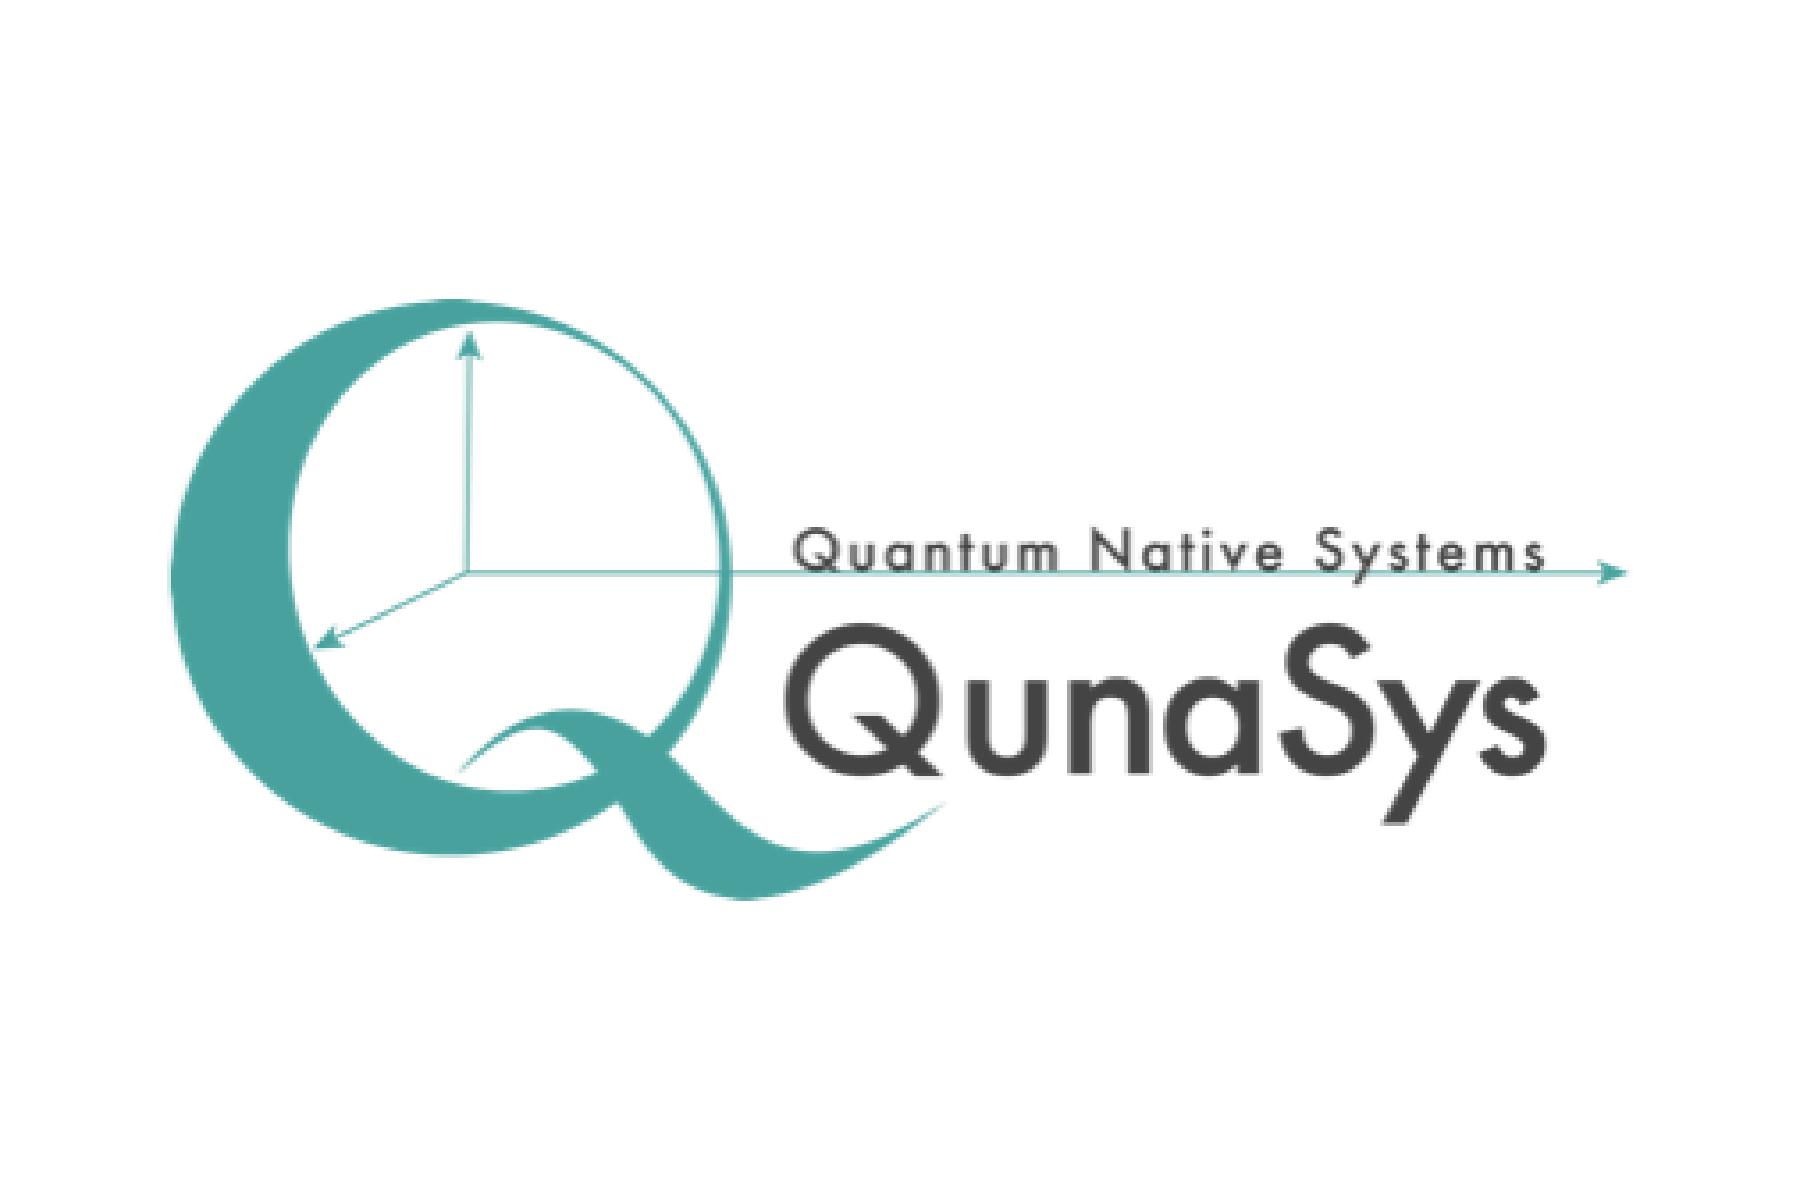 【JXTGホールディングス×QunaSys】 量子コンピュータ実応用事例の発掘と社会実装に向け、共同開発を本格化